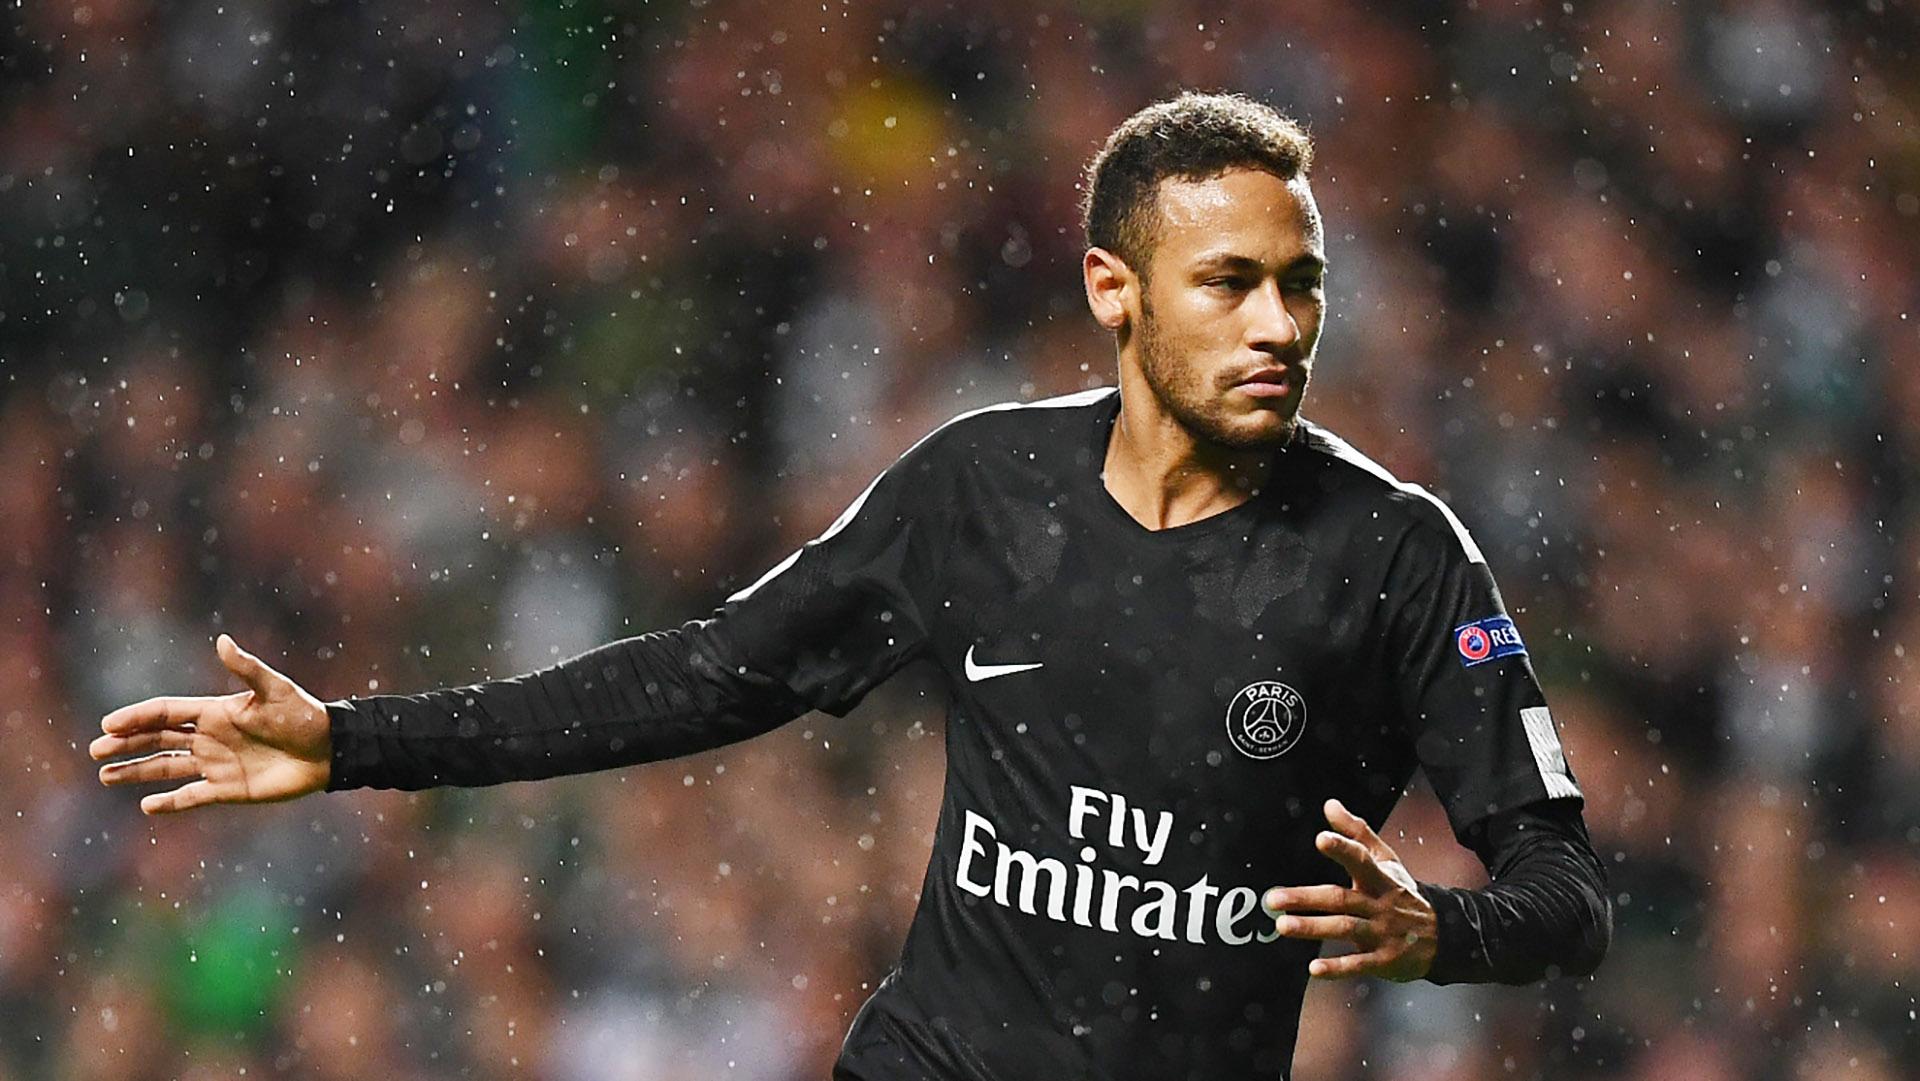 Presidente oferece €1 mi para Cavani deixar pênaltis a Neymar